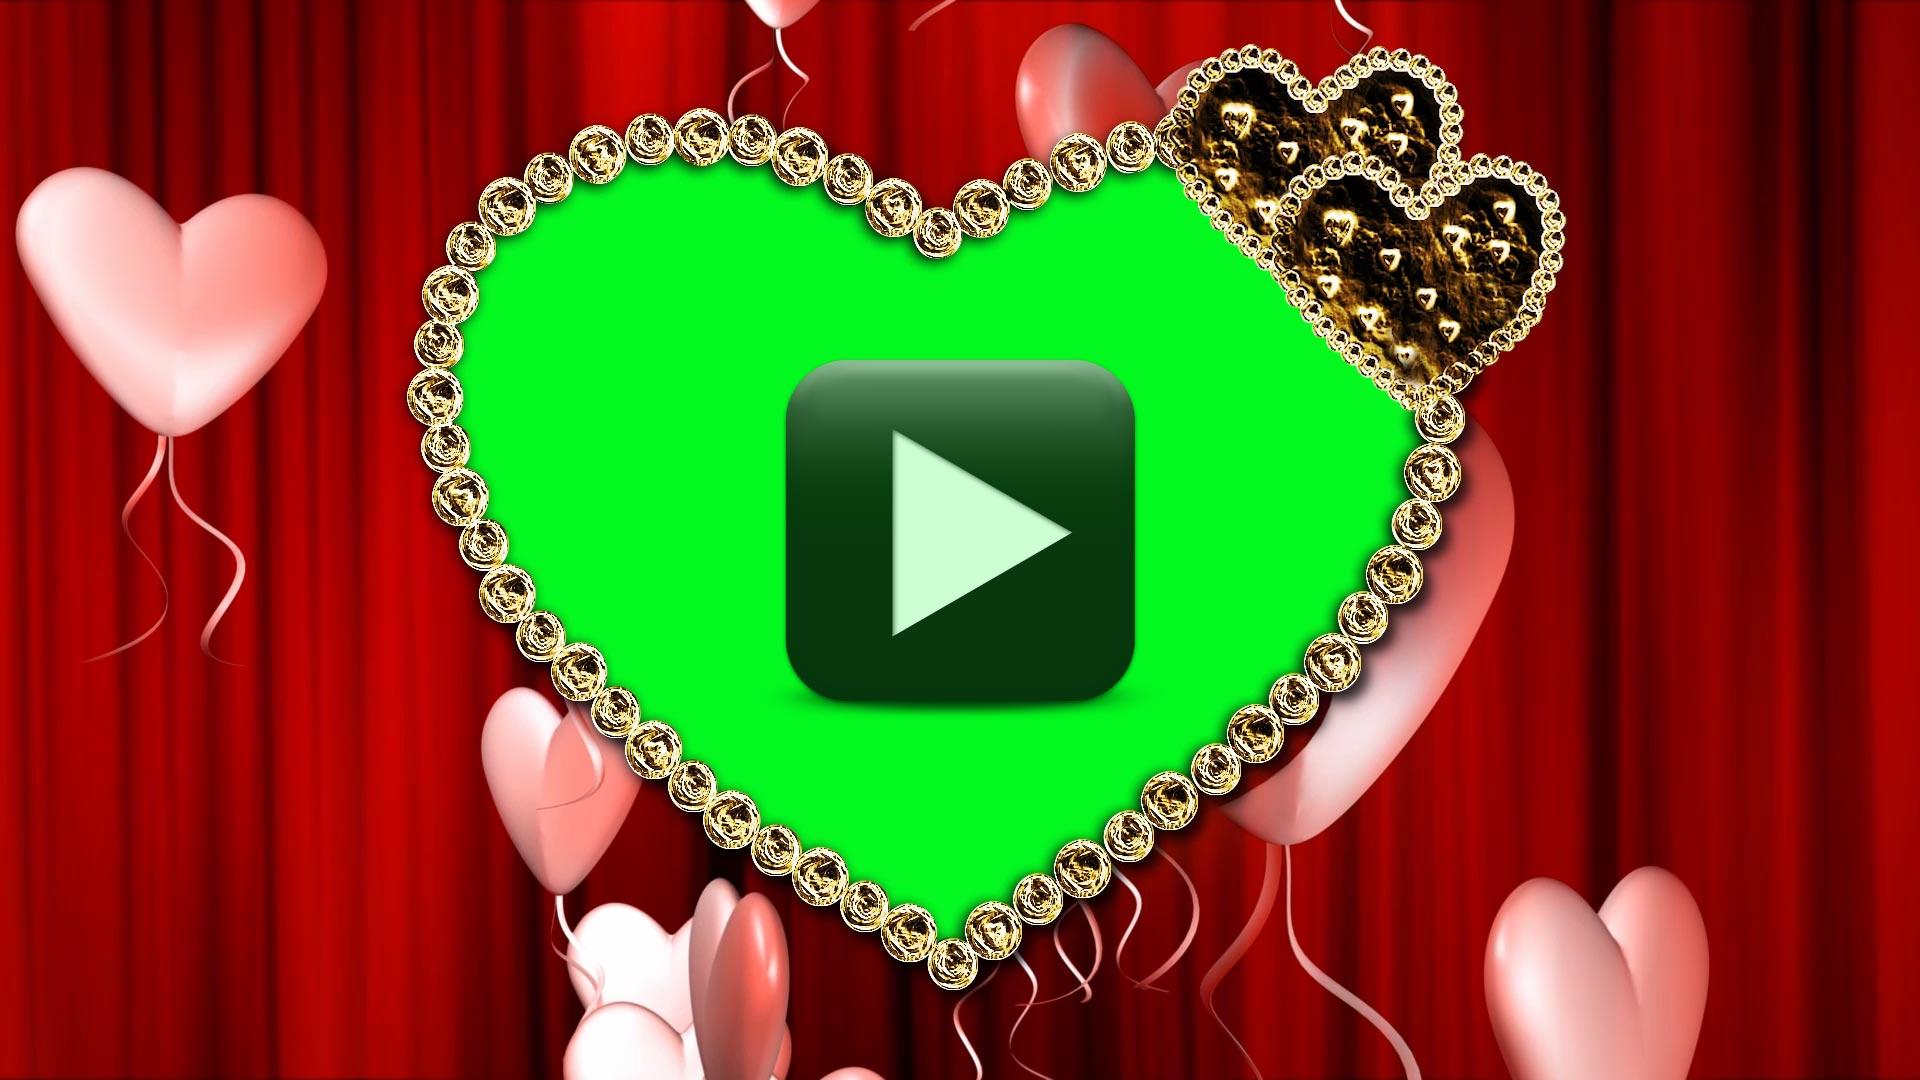 Wedding Video Background Effects HD